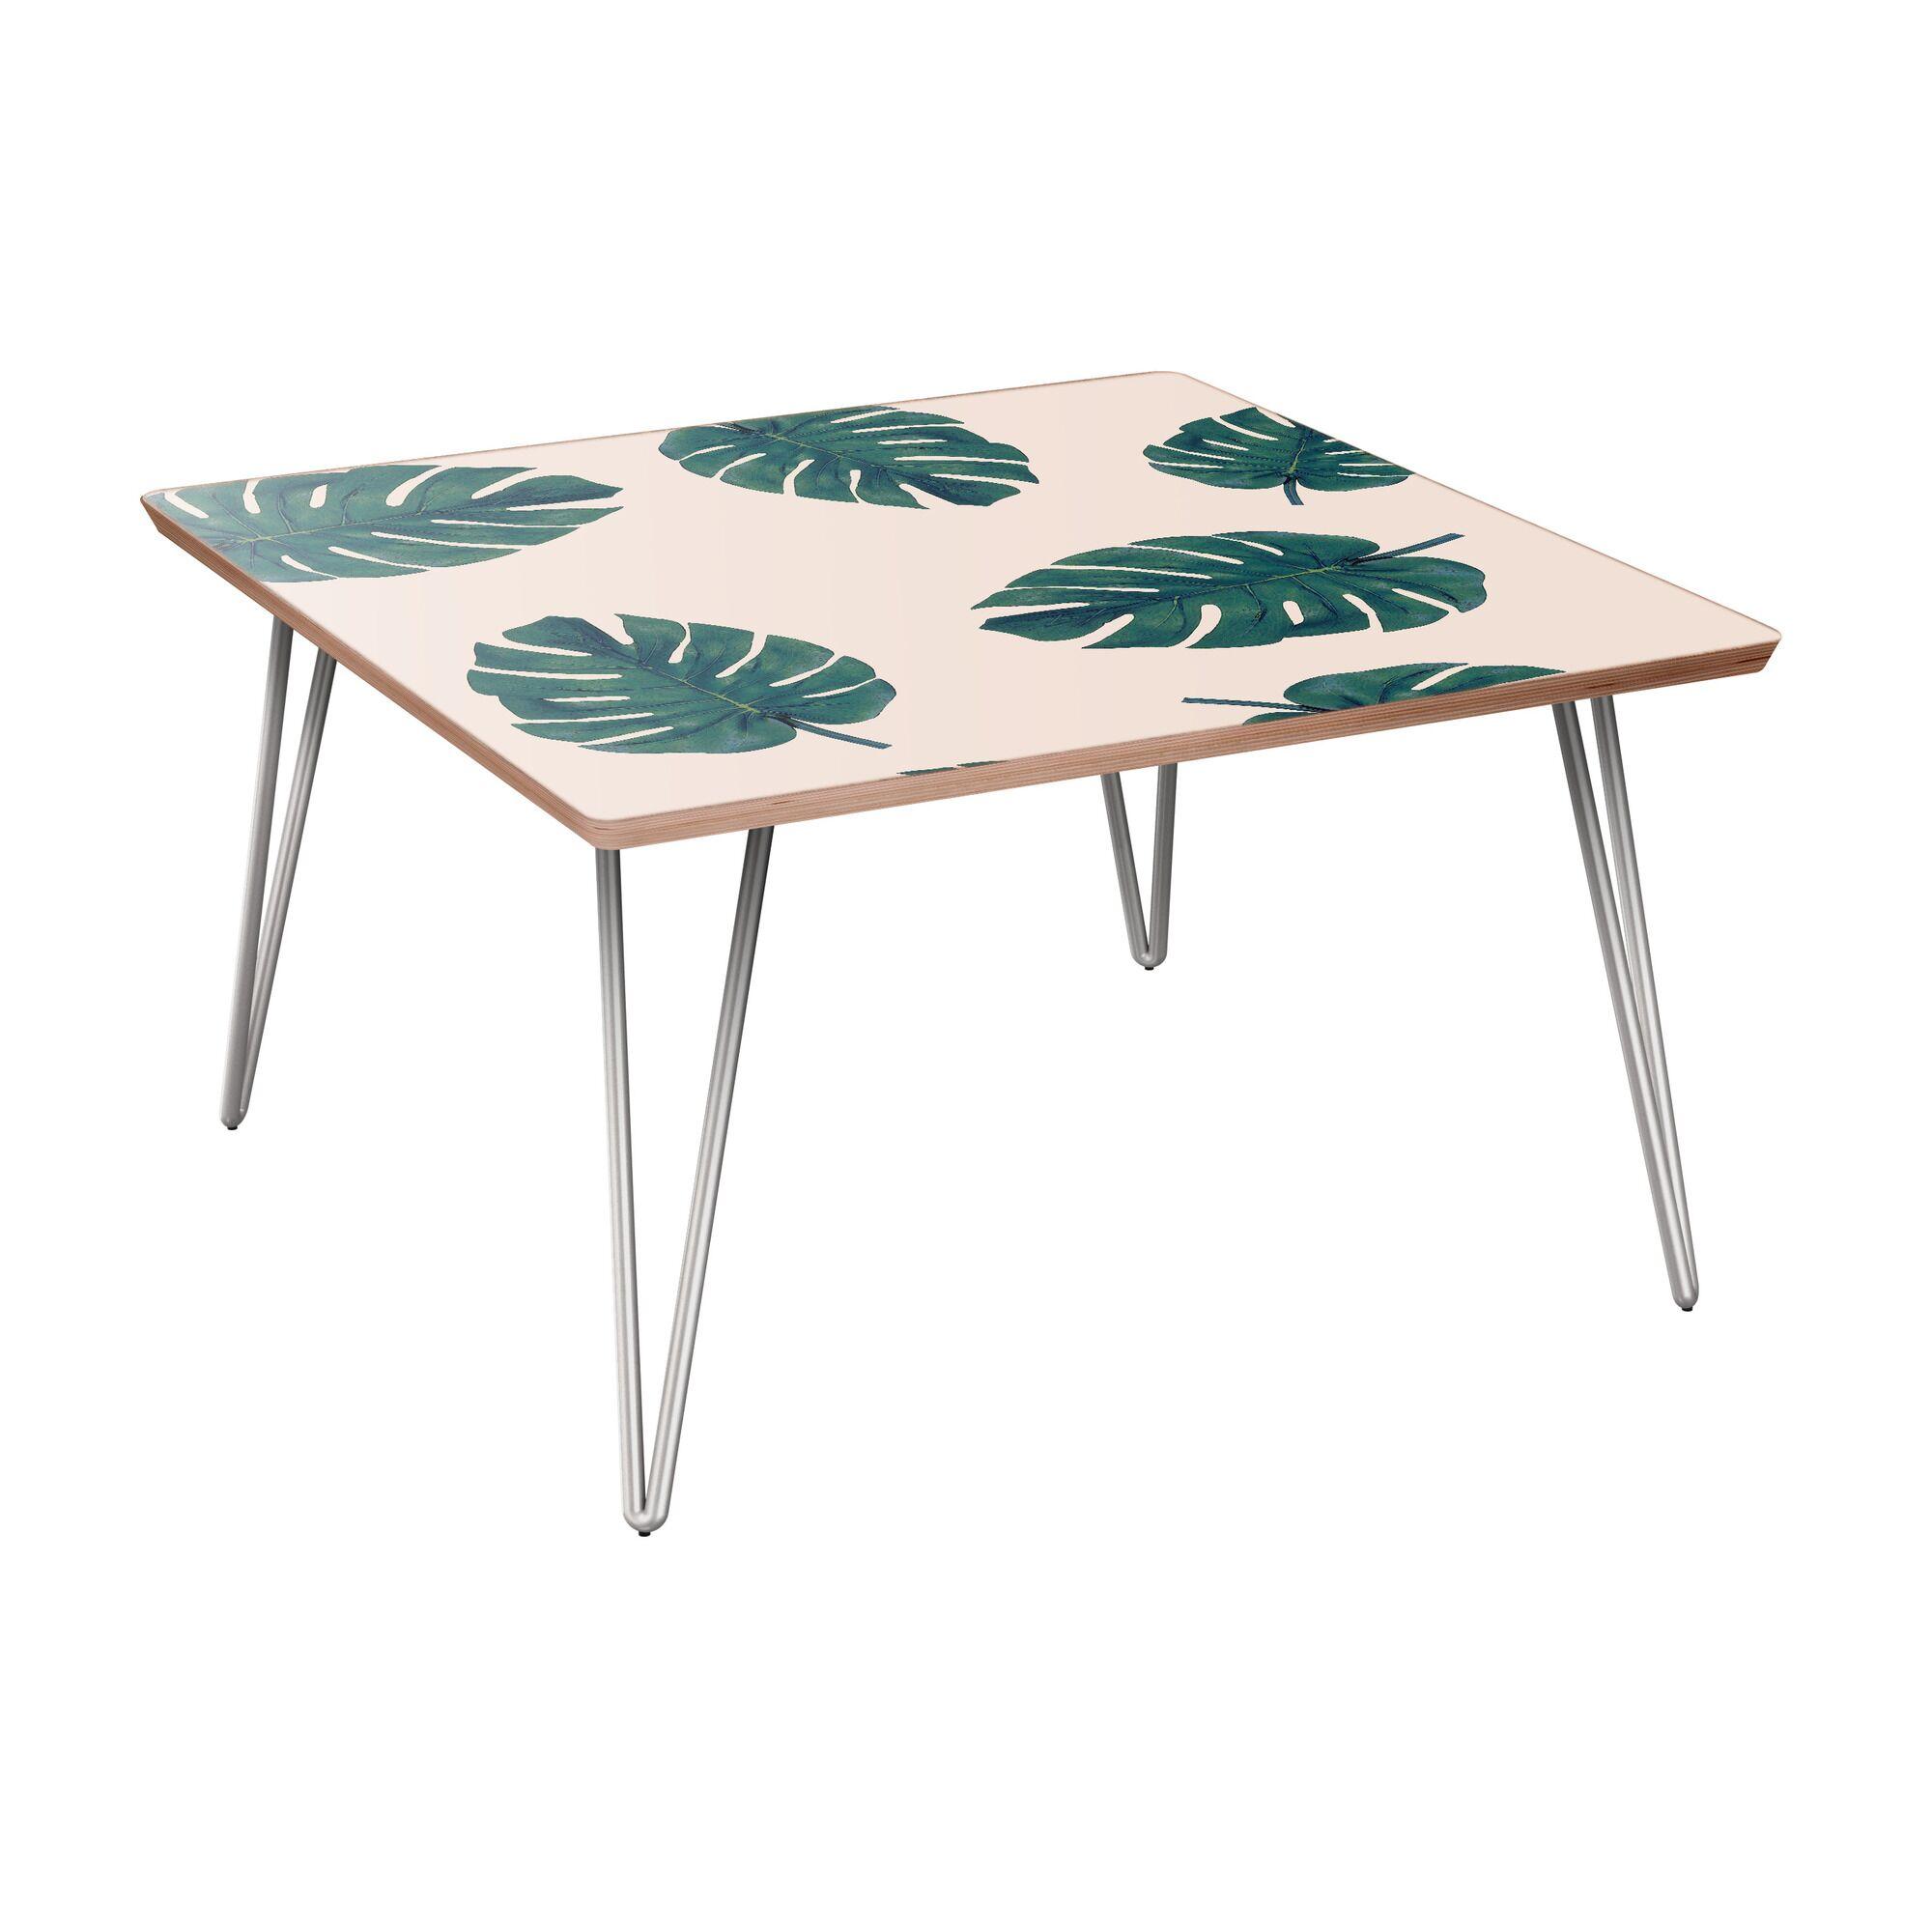 Schiffman Coffee Table Table Base Color: Chrome, Table Top Color: Walnut